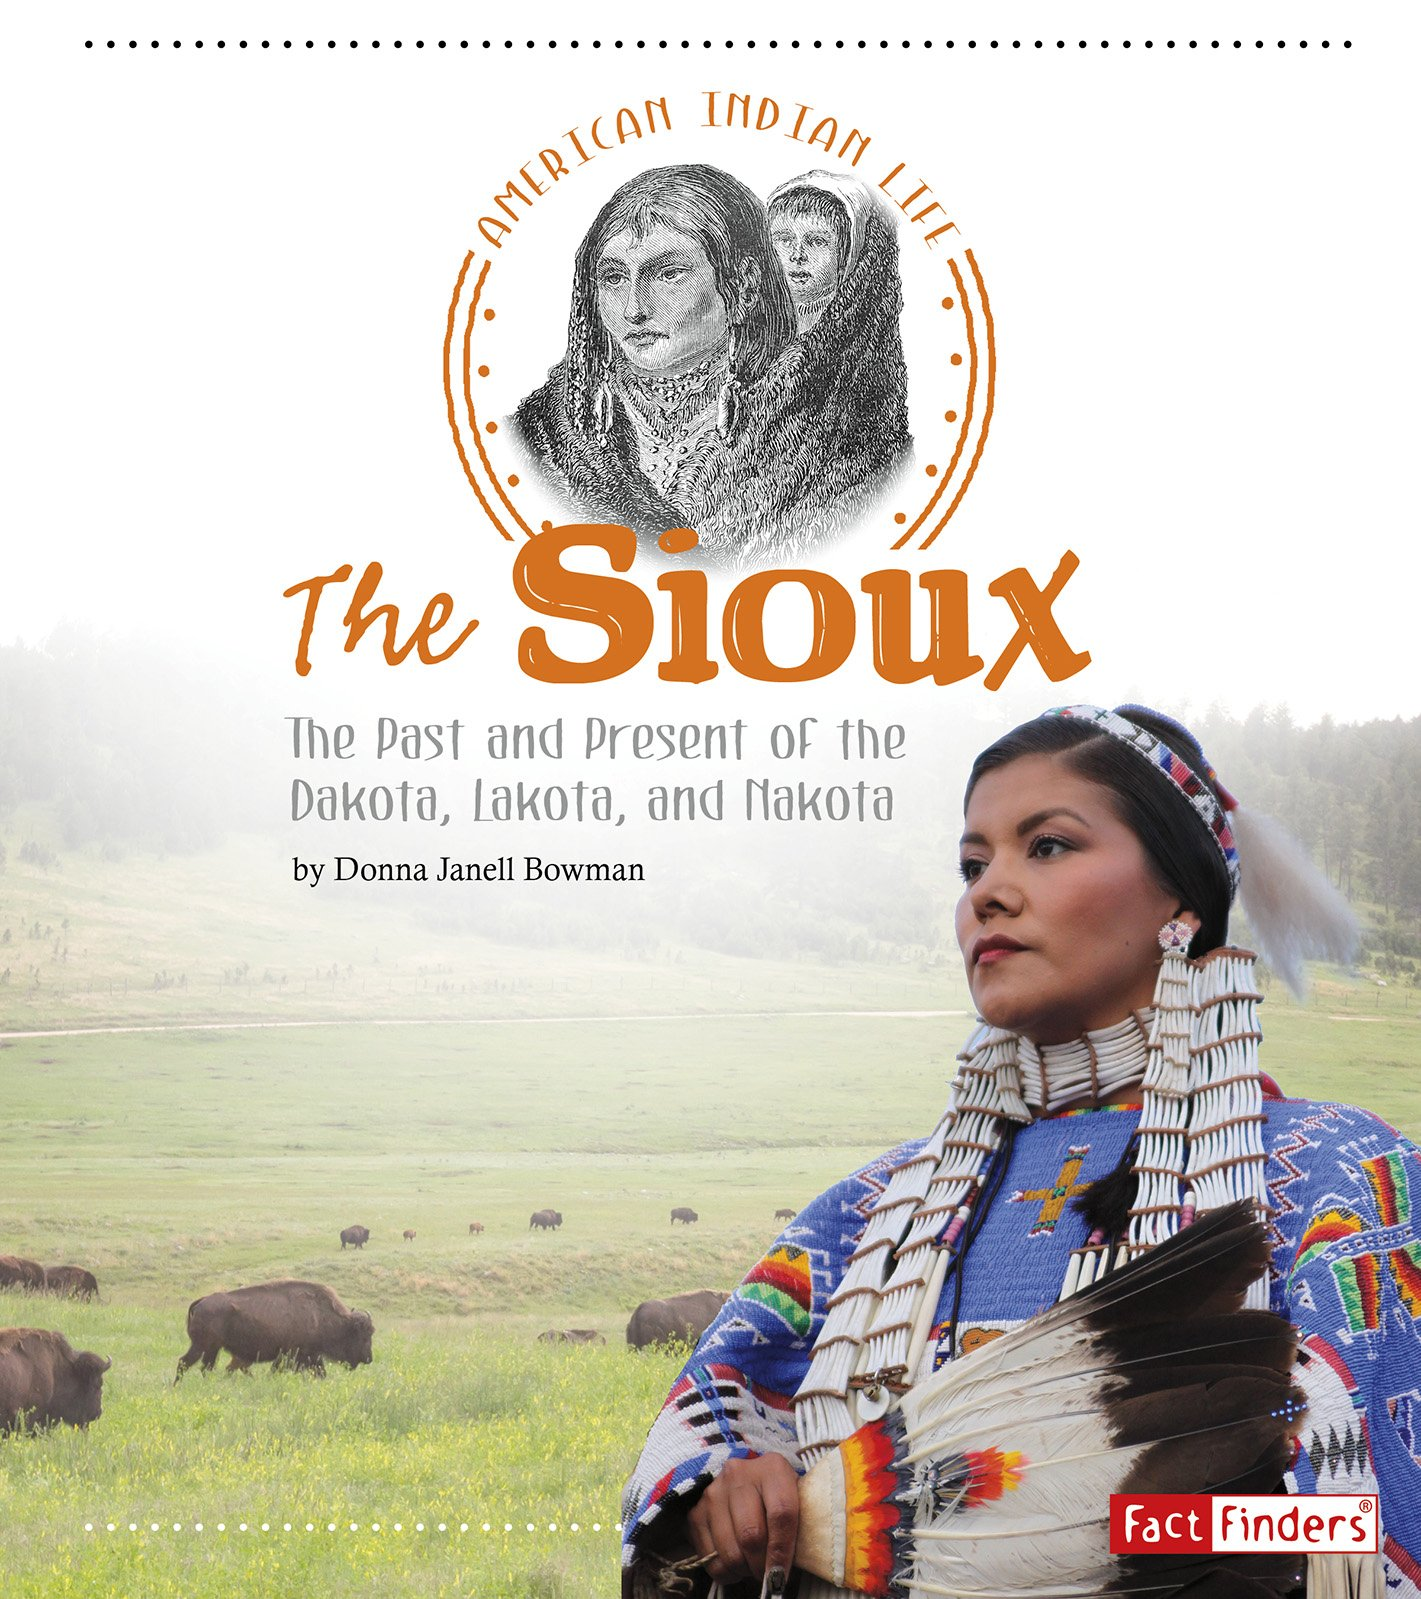 The Sioux: The Past and Present of the Dakota Lakota and Nakota (American Indian Life)